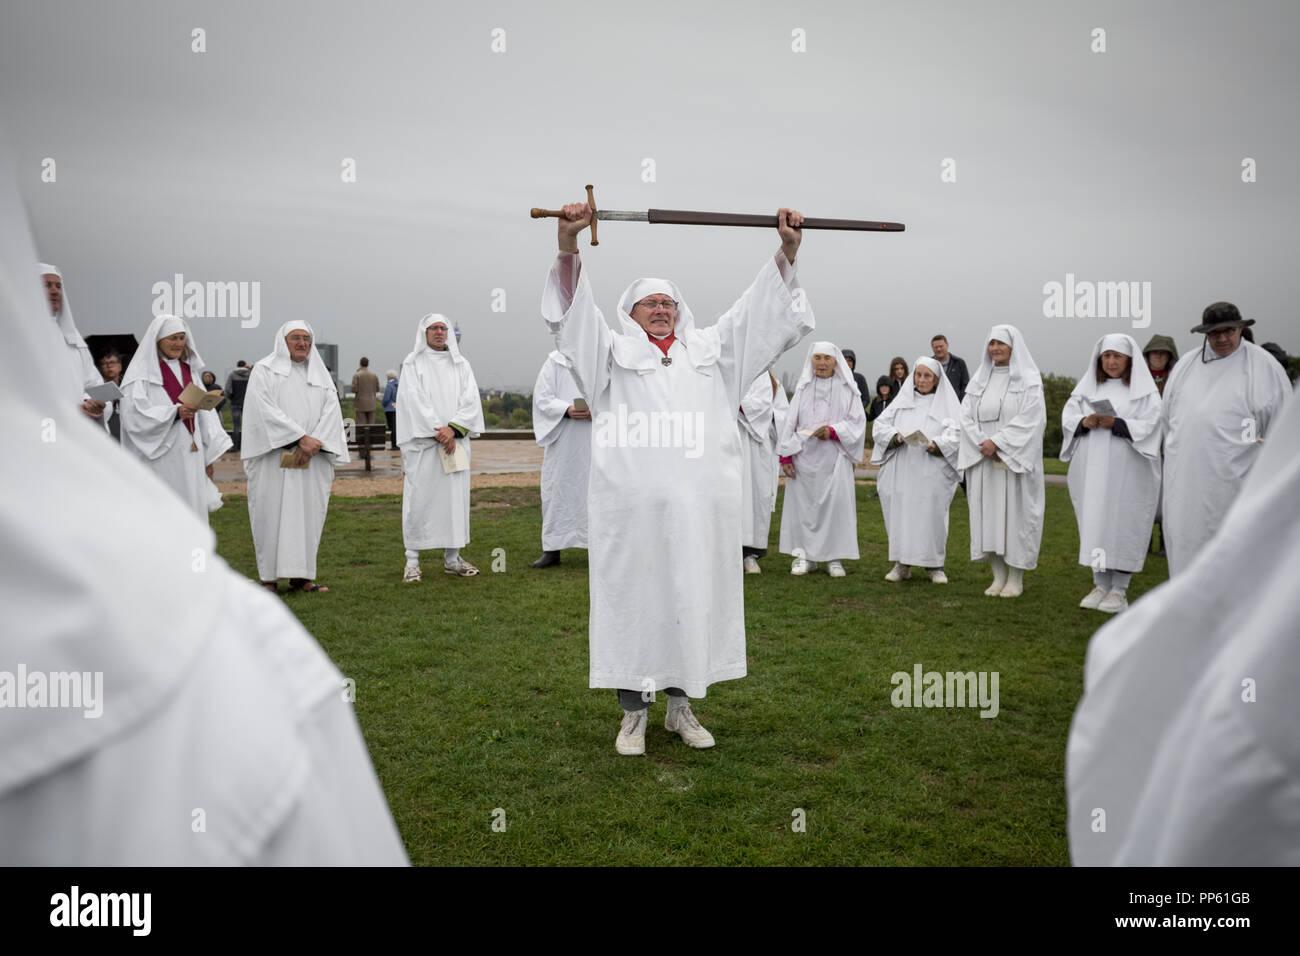 London, UK. 23rd September, 2018. British Druid Order celebrates Autumnal Equinox on Primrose Hill. Credit: Guy Corbishley/Alamy Live News - Stock Image